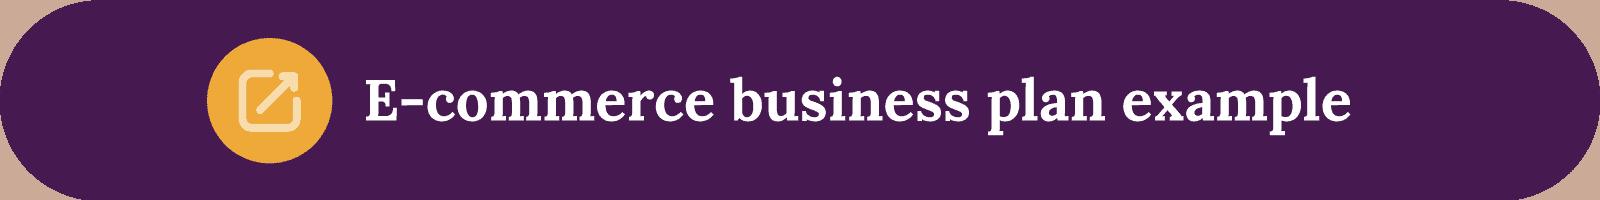 E-commerce business plan template button